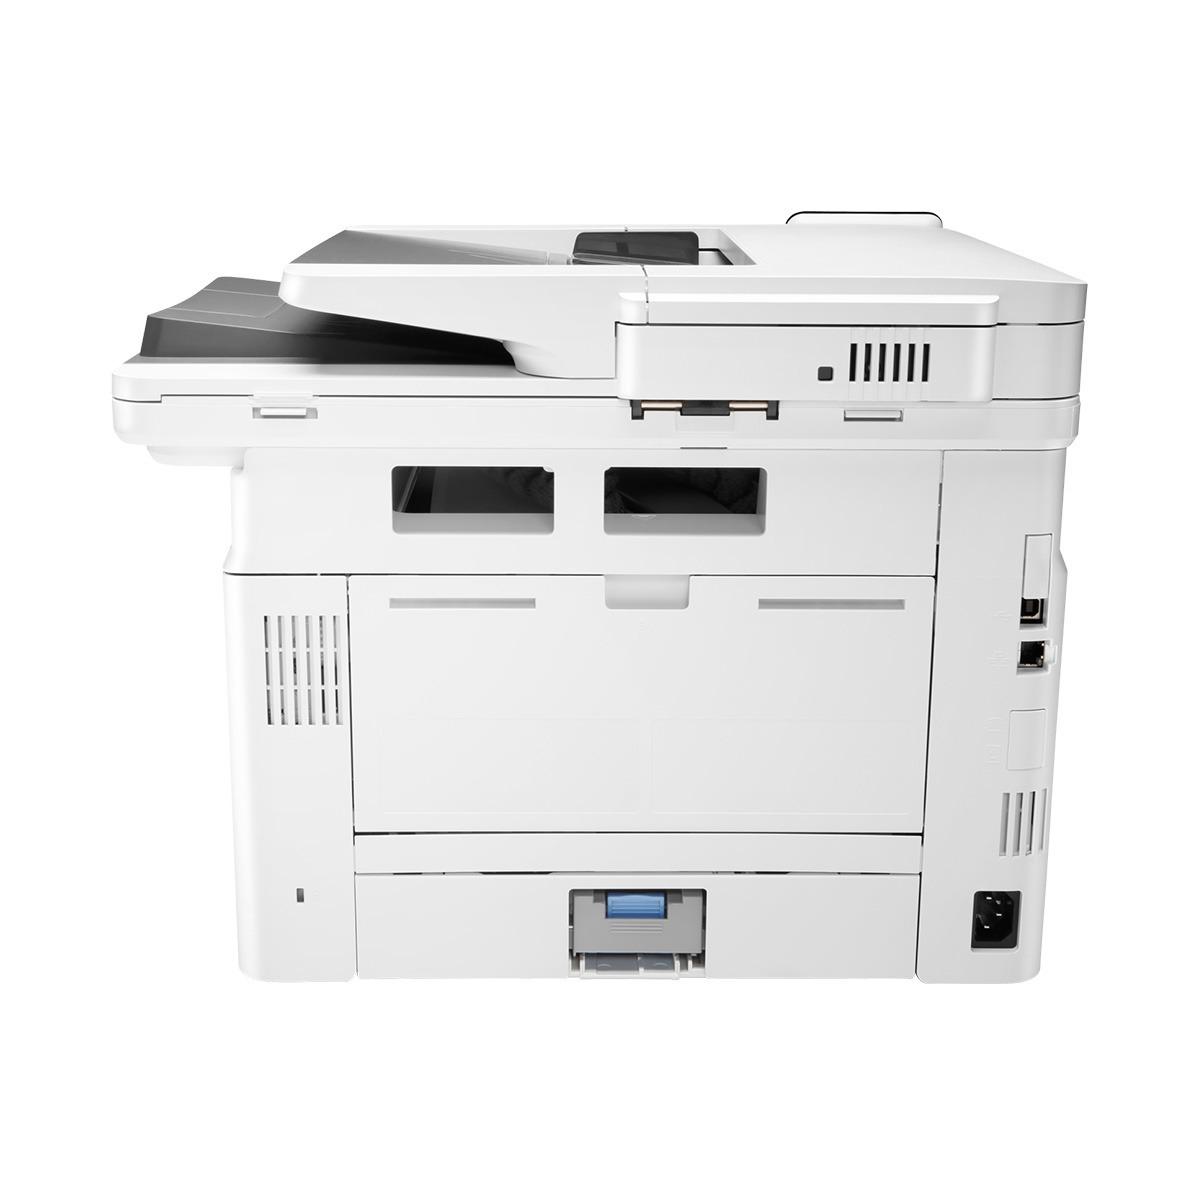 Impresora Laser Multifuncion Hp M428fdw Wifi Duplex Cuotas